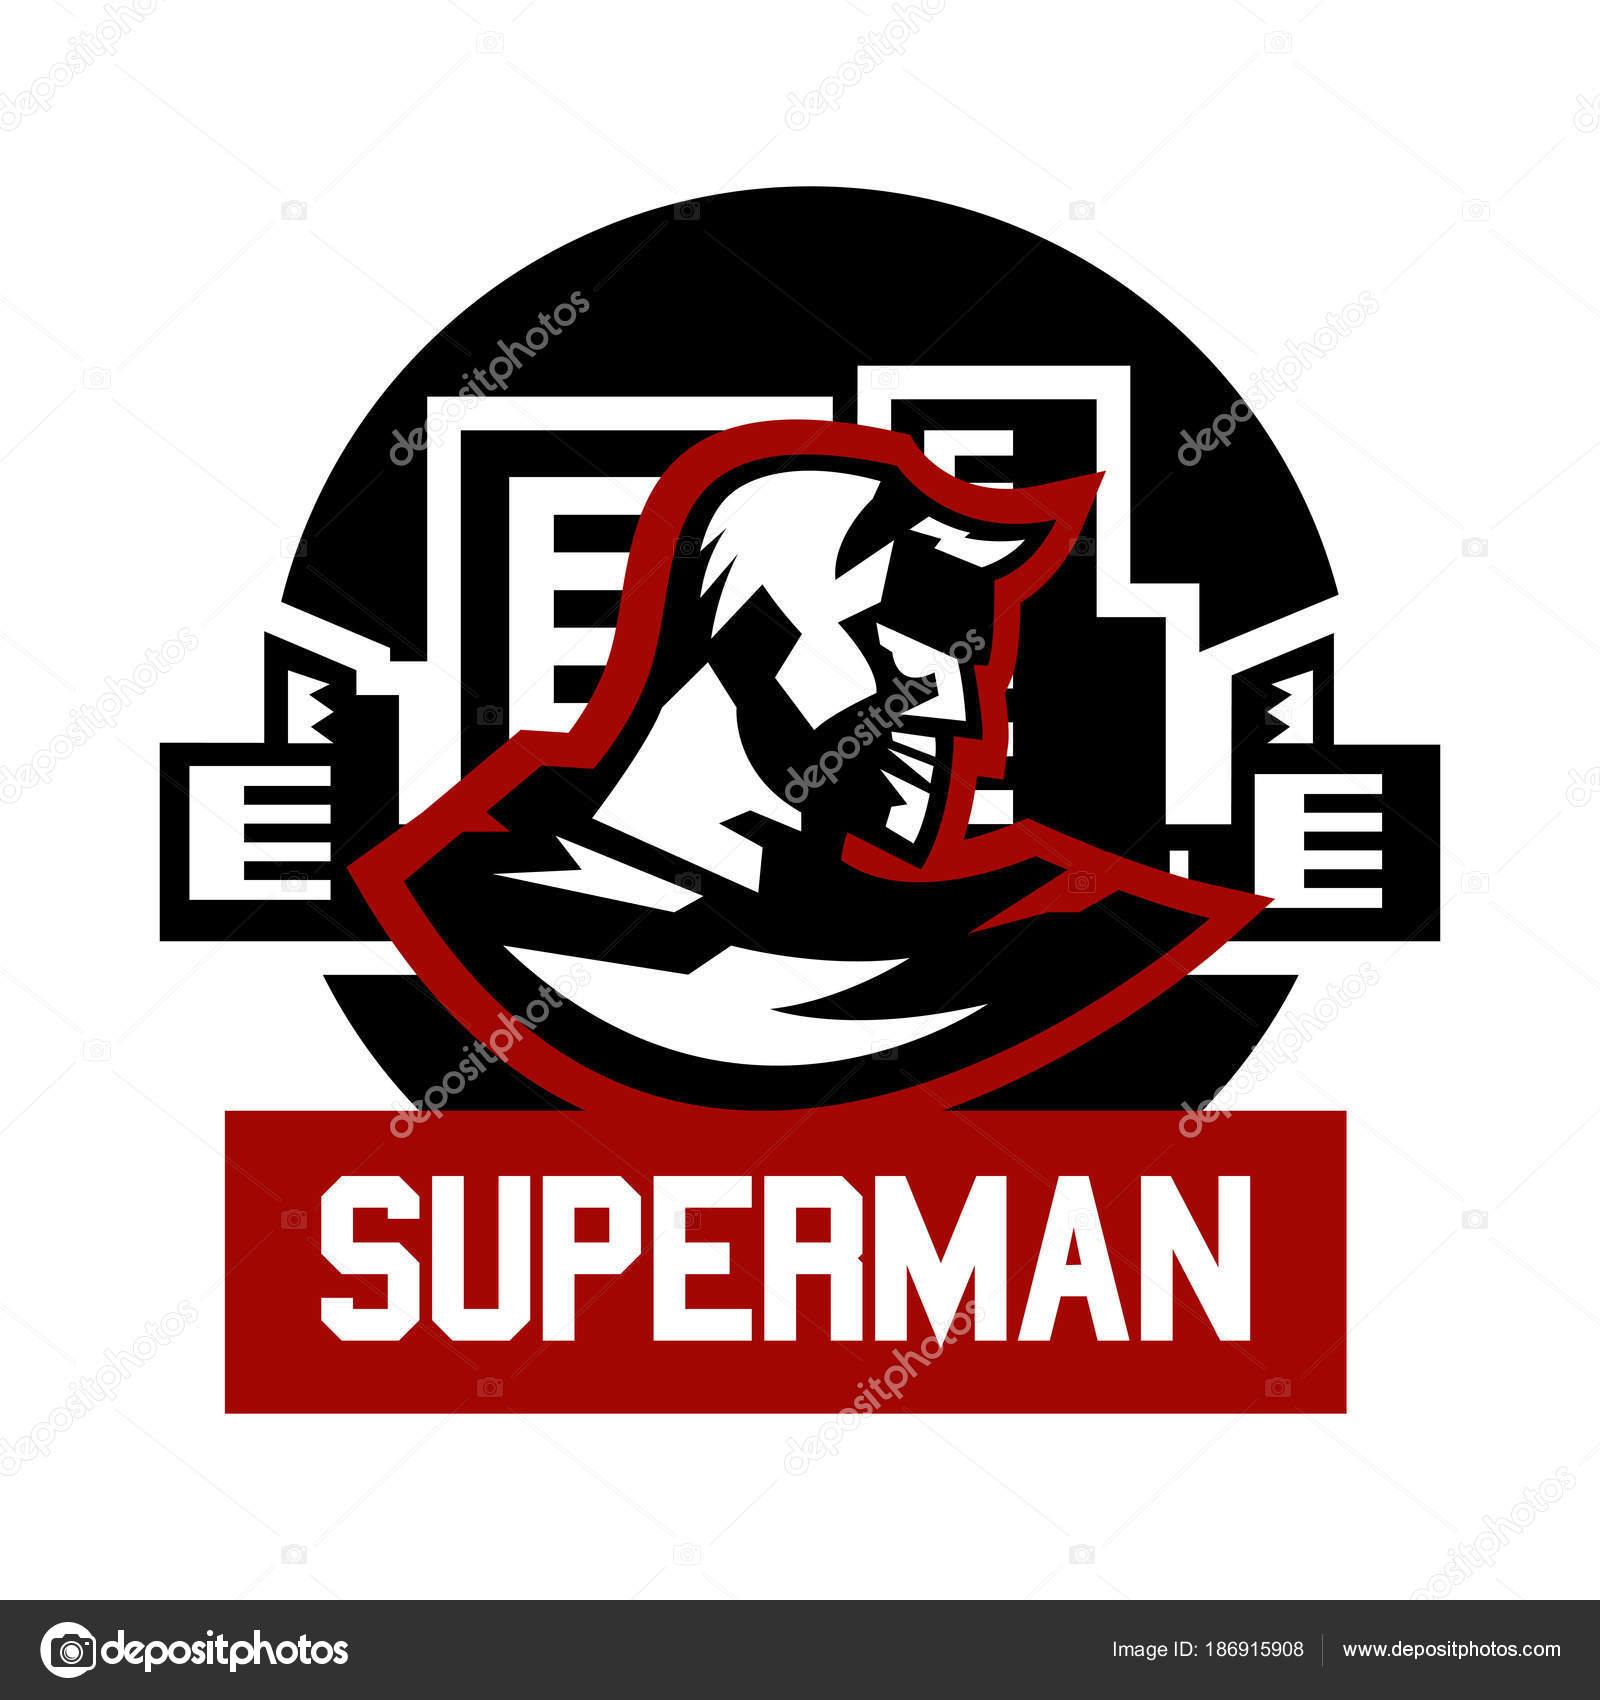 Superman Logo. Superhelden-Kostüm, Kap, Stadt. Vektor-Illustration ...